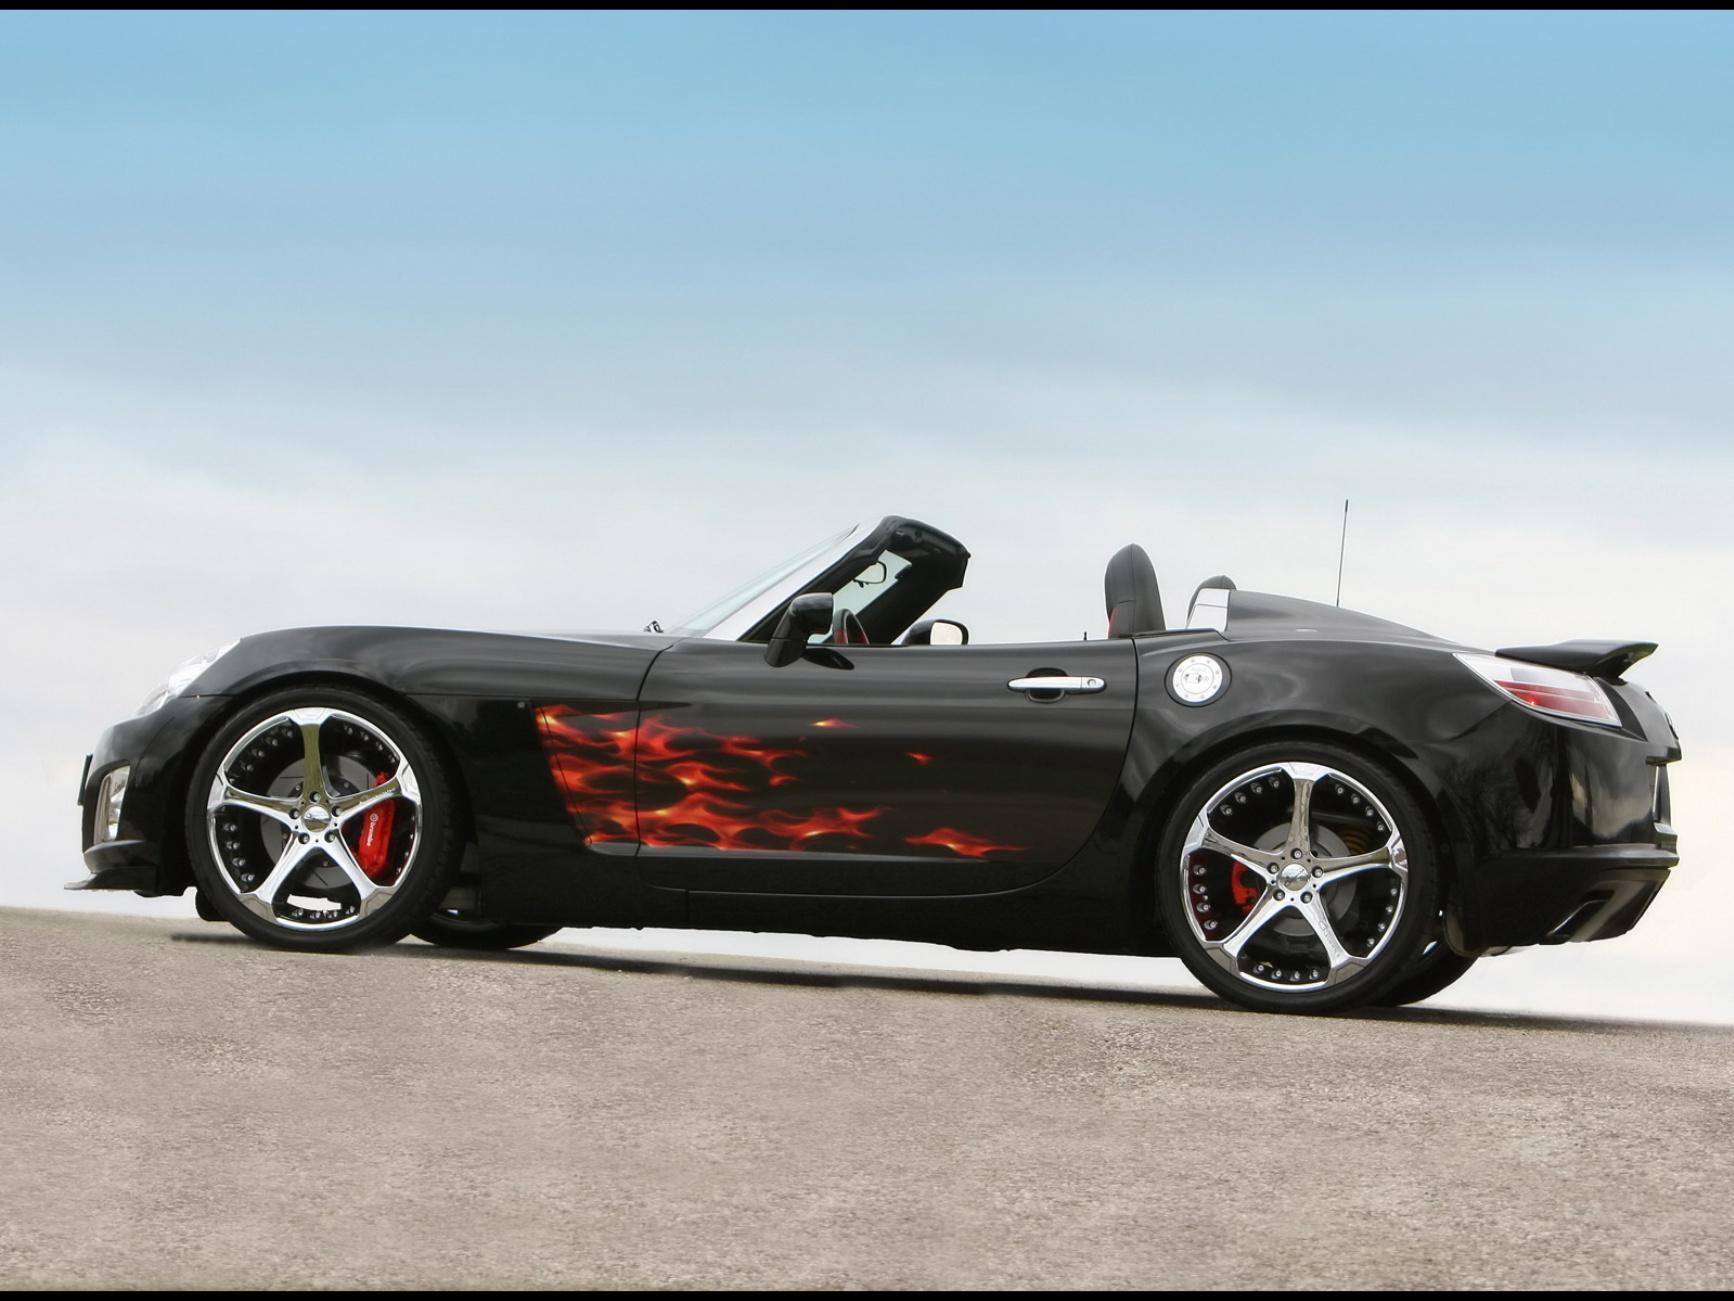 Opel GTaime tuning - 1734x1301